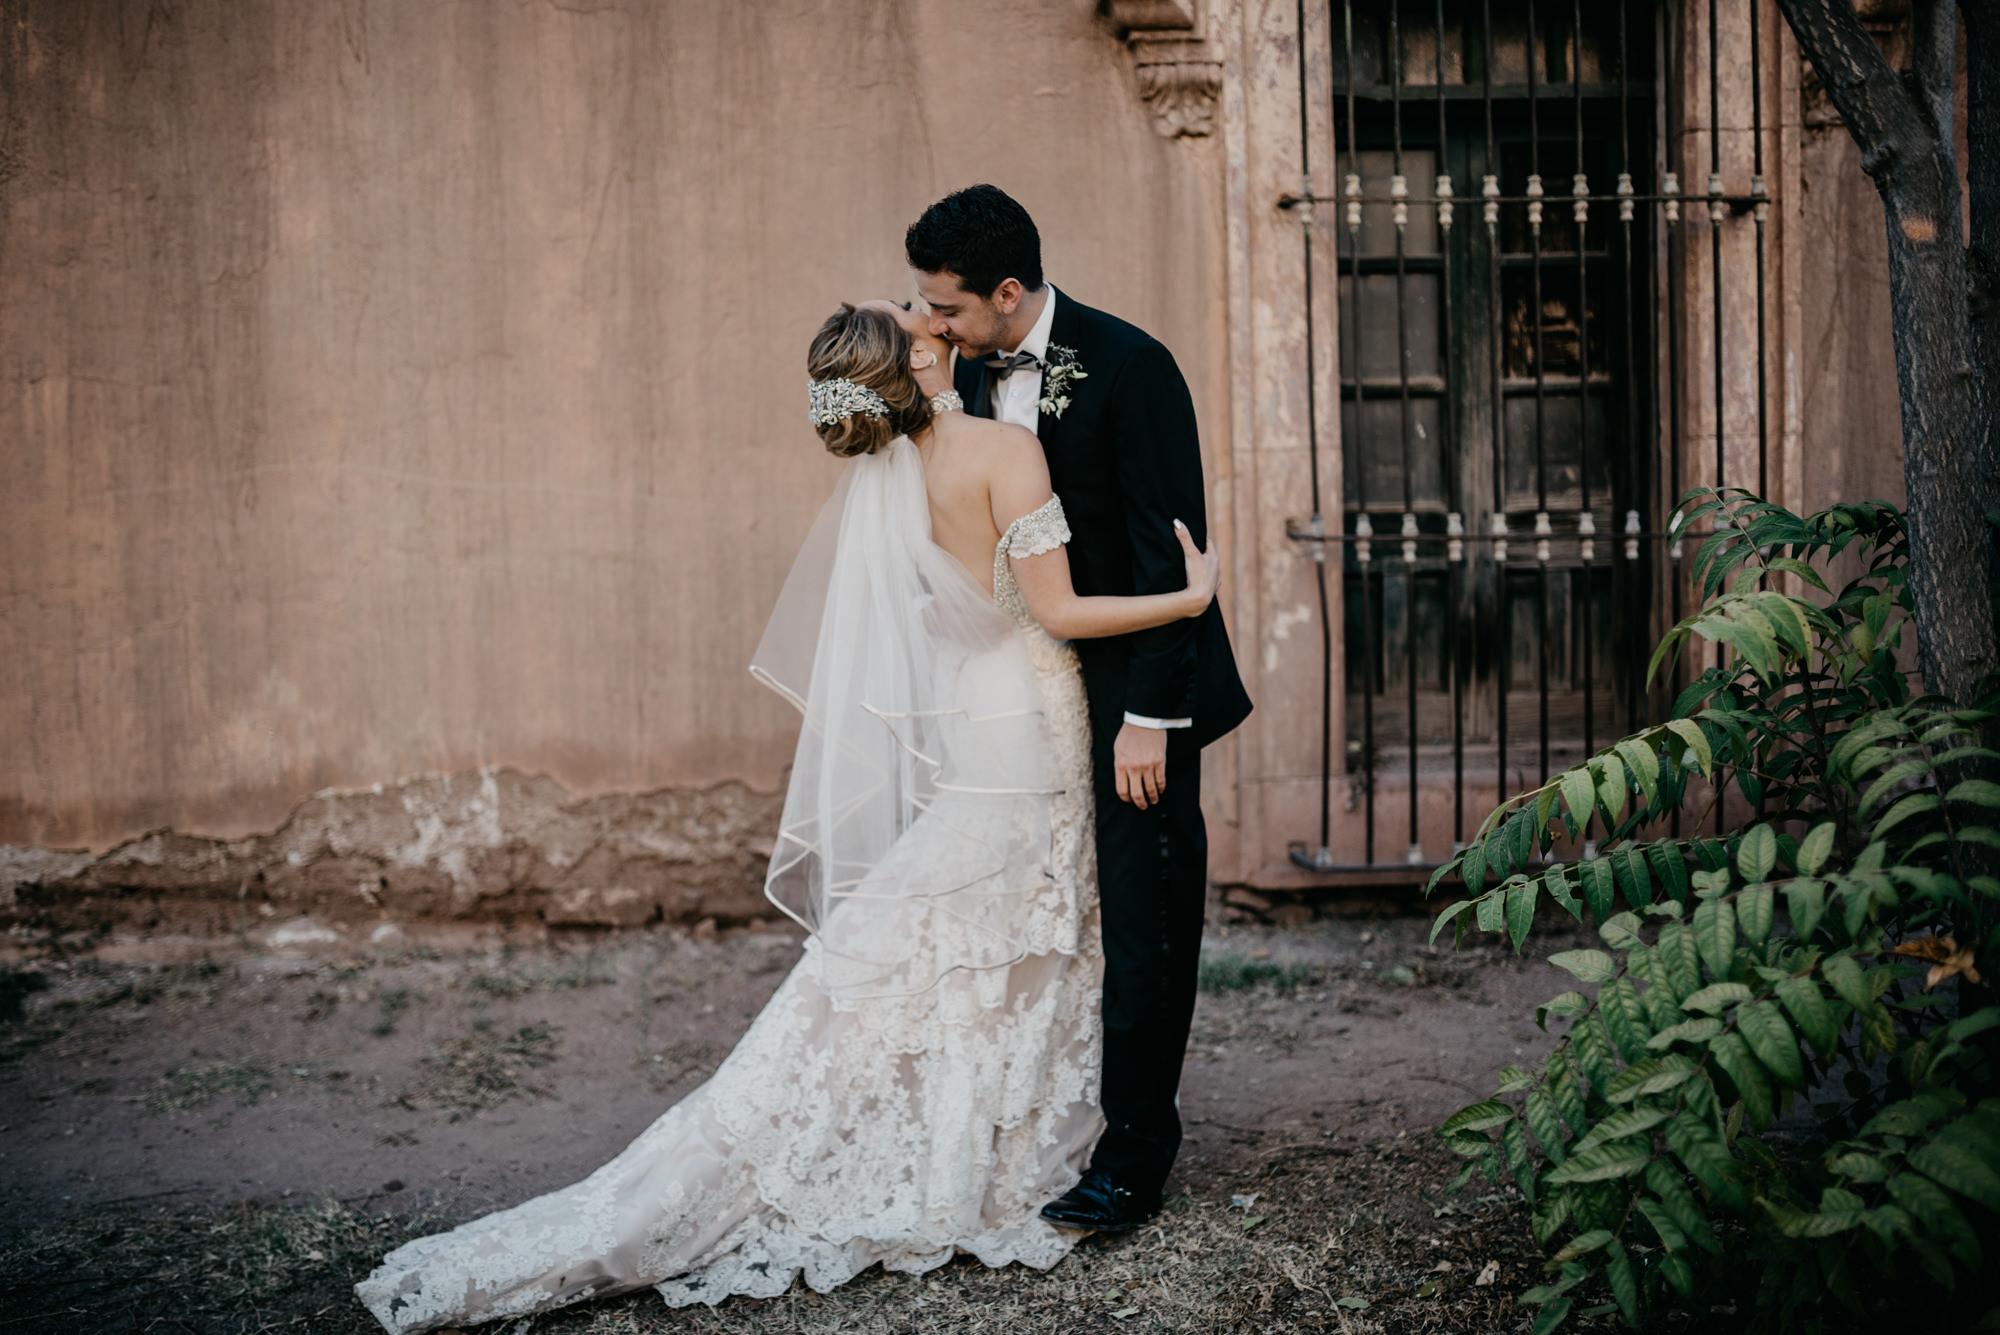 Mario-Karla-Wedding-105